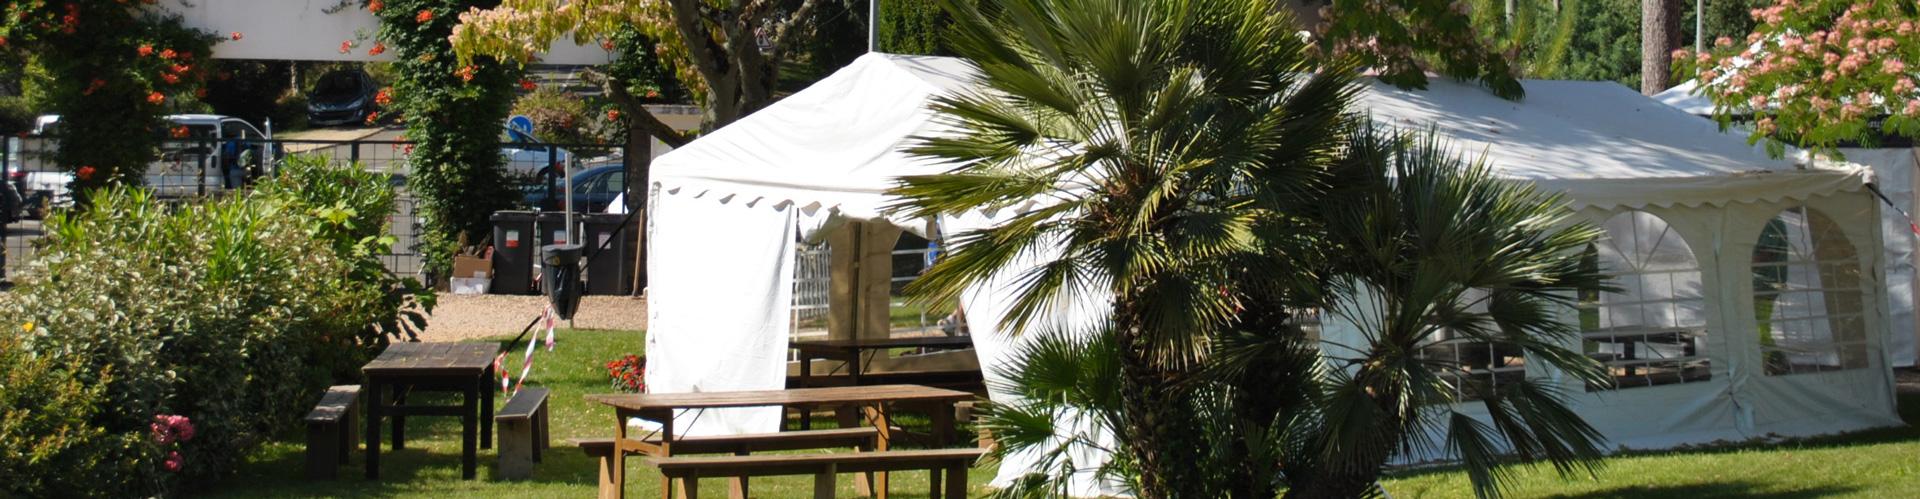 slider-location-chapiteau